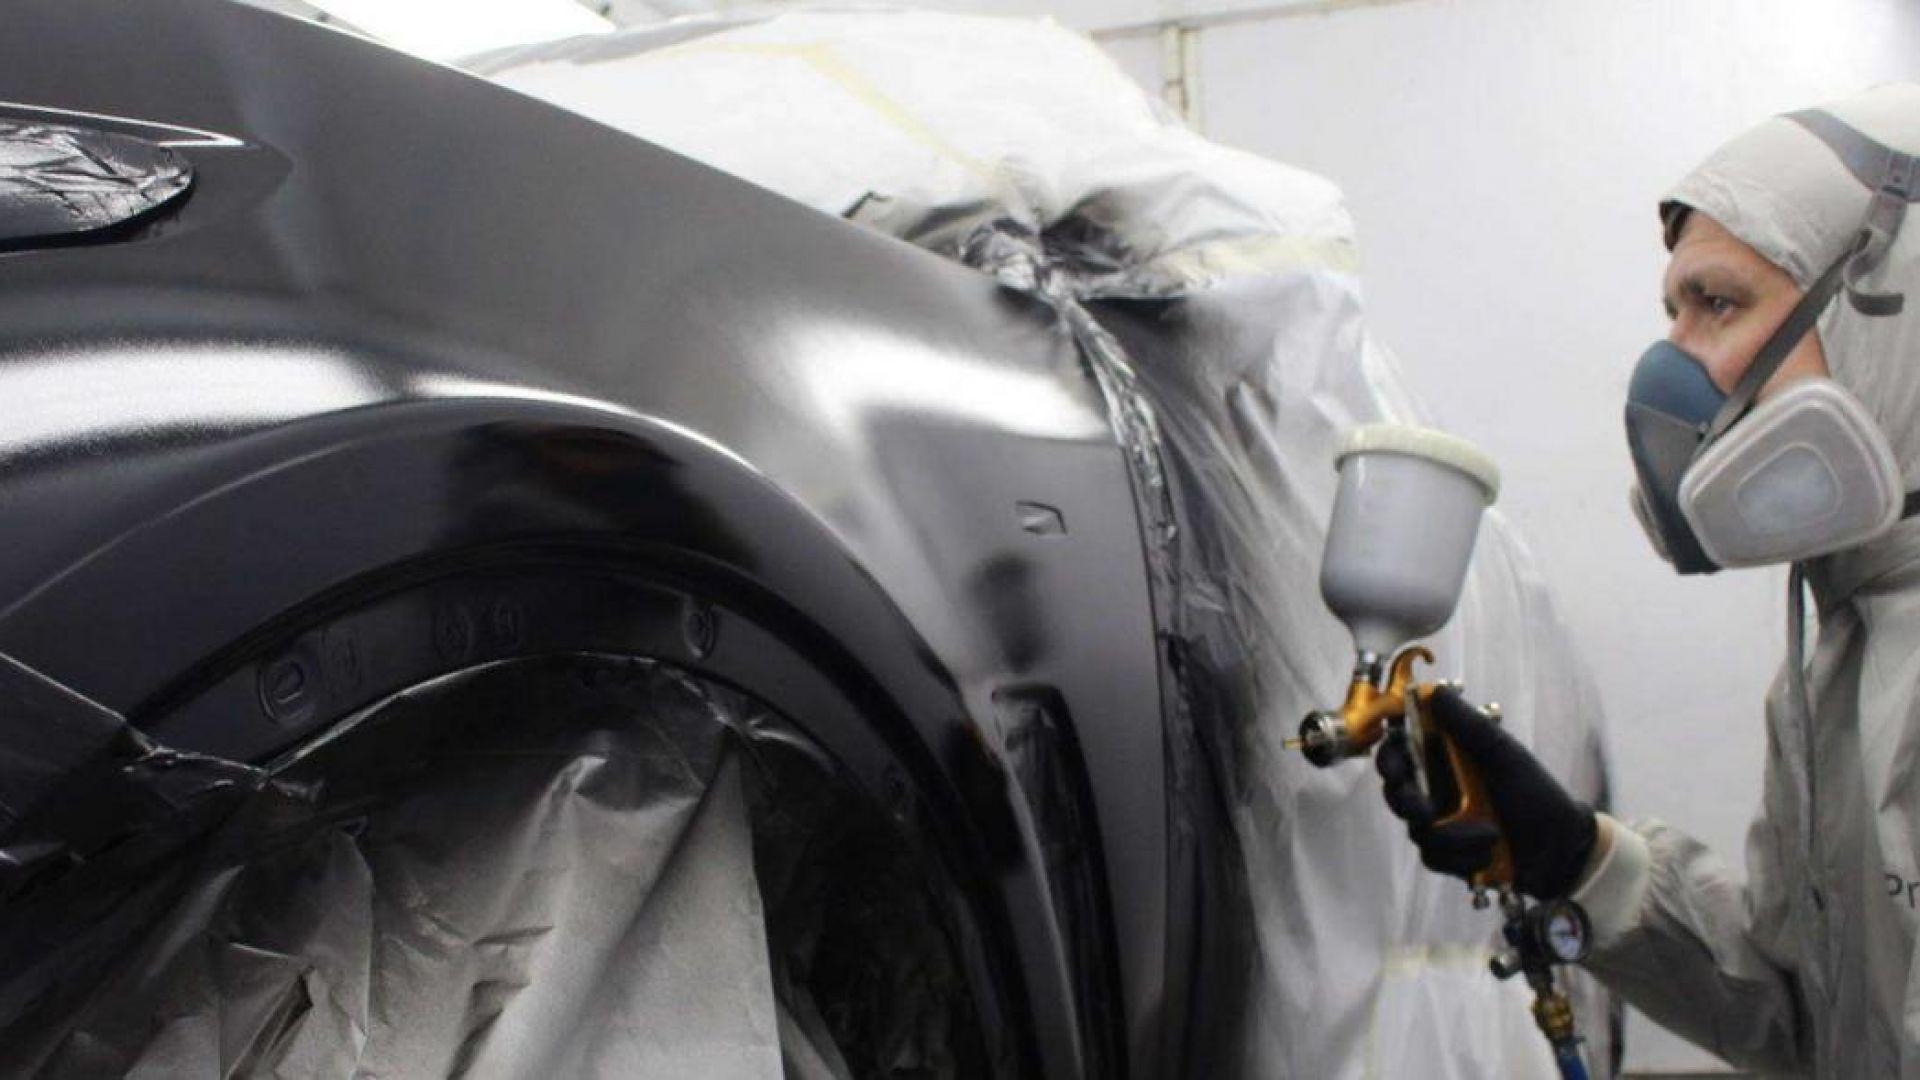 Восстановление кузова автомобиля при помощи пескоструйного аппарата